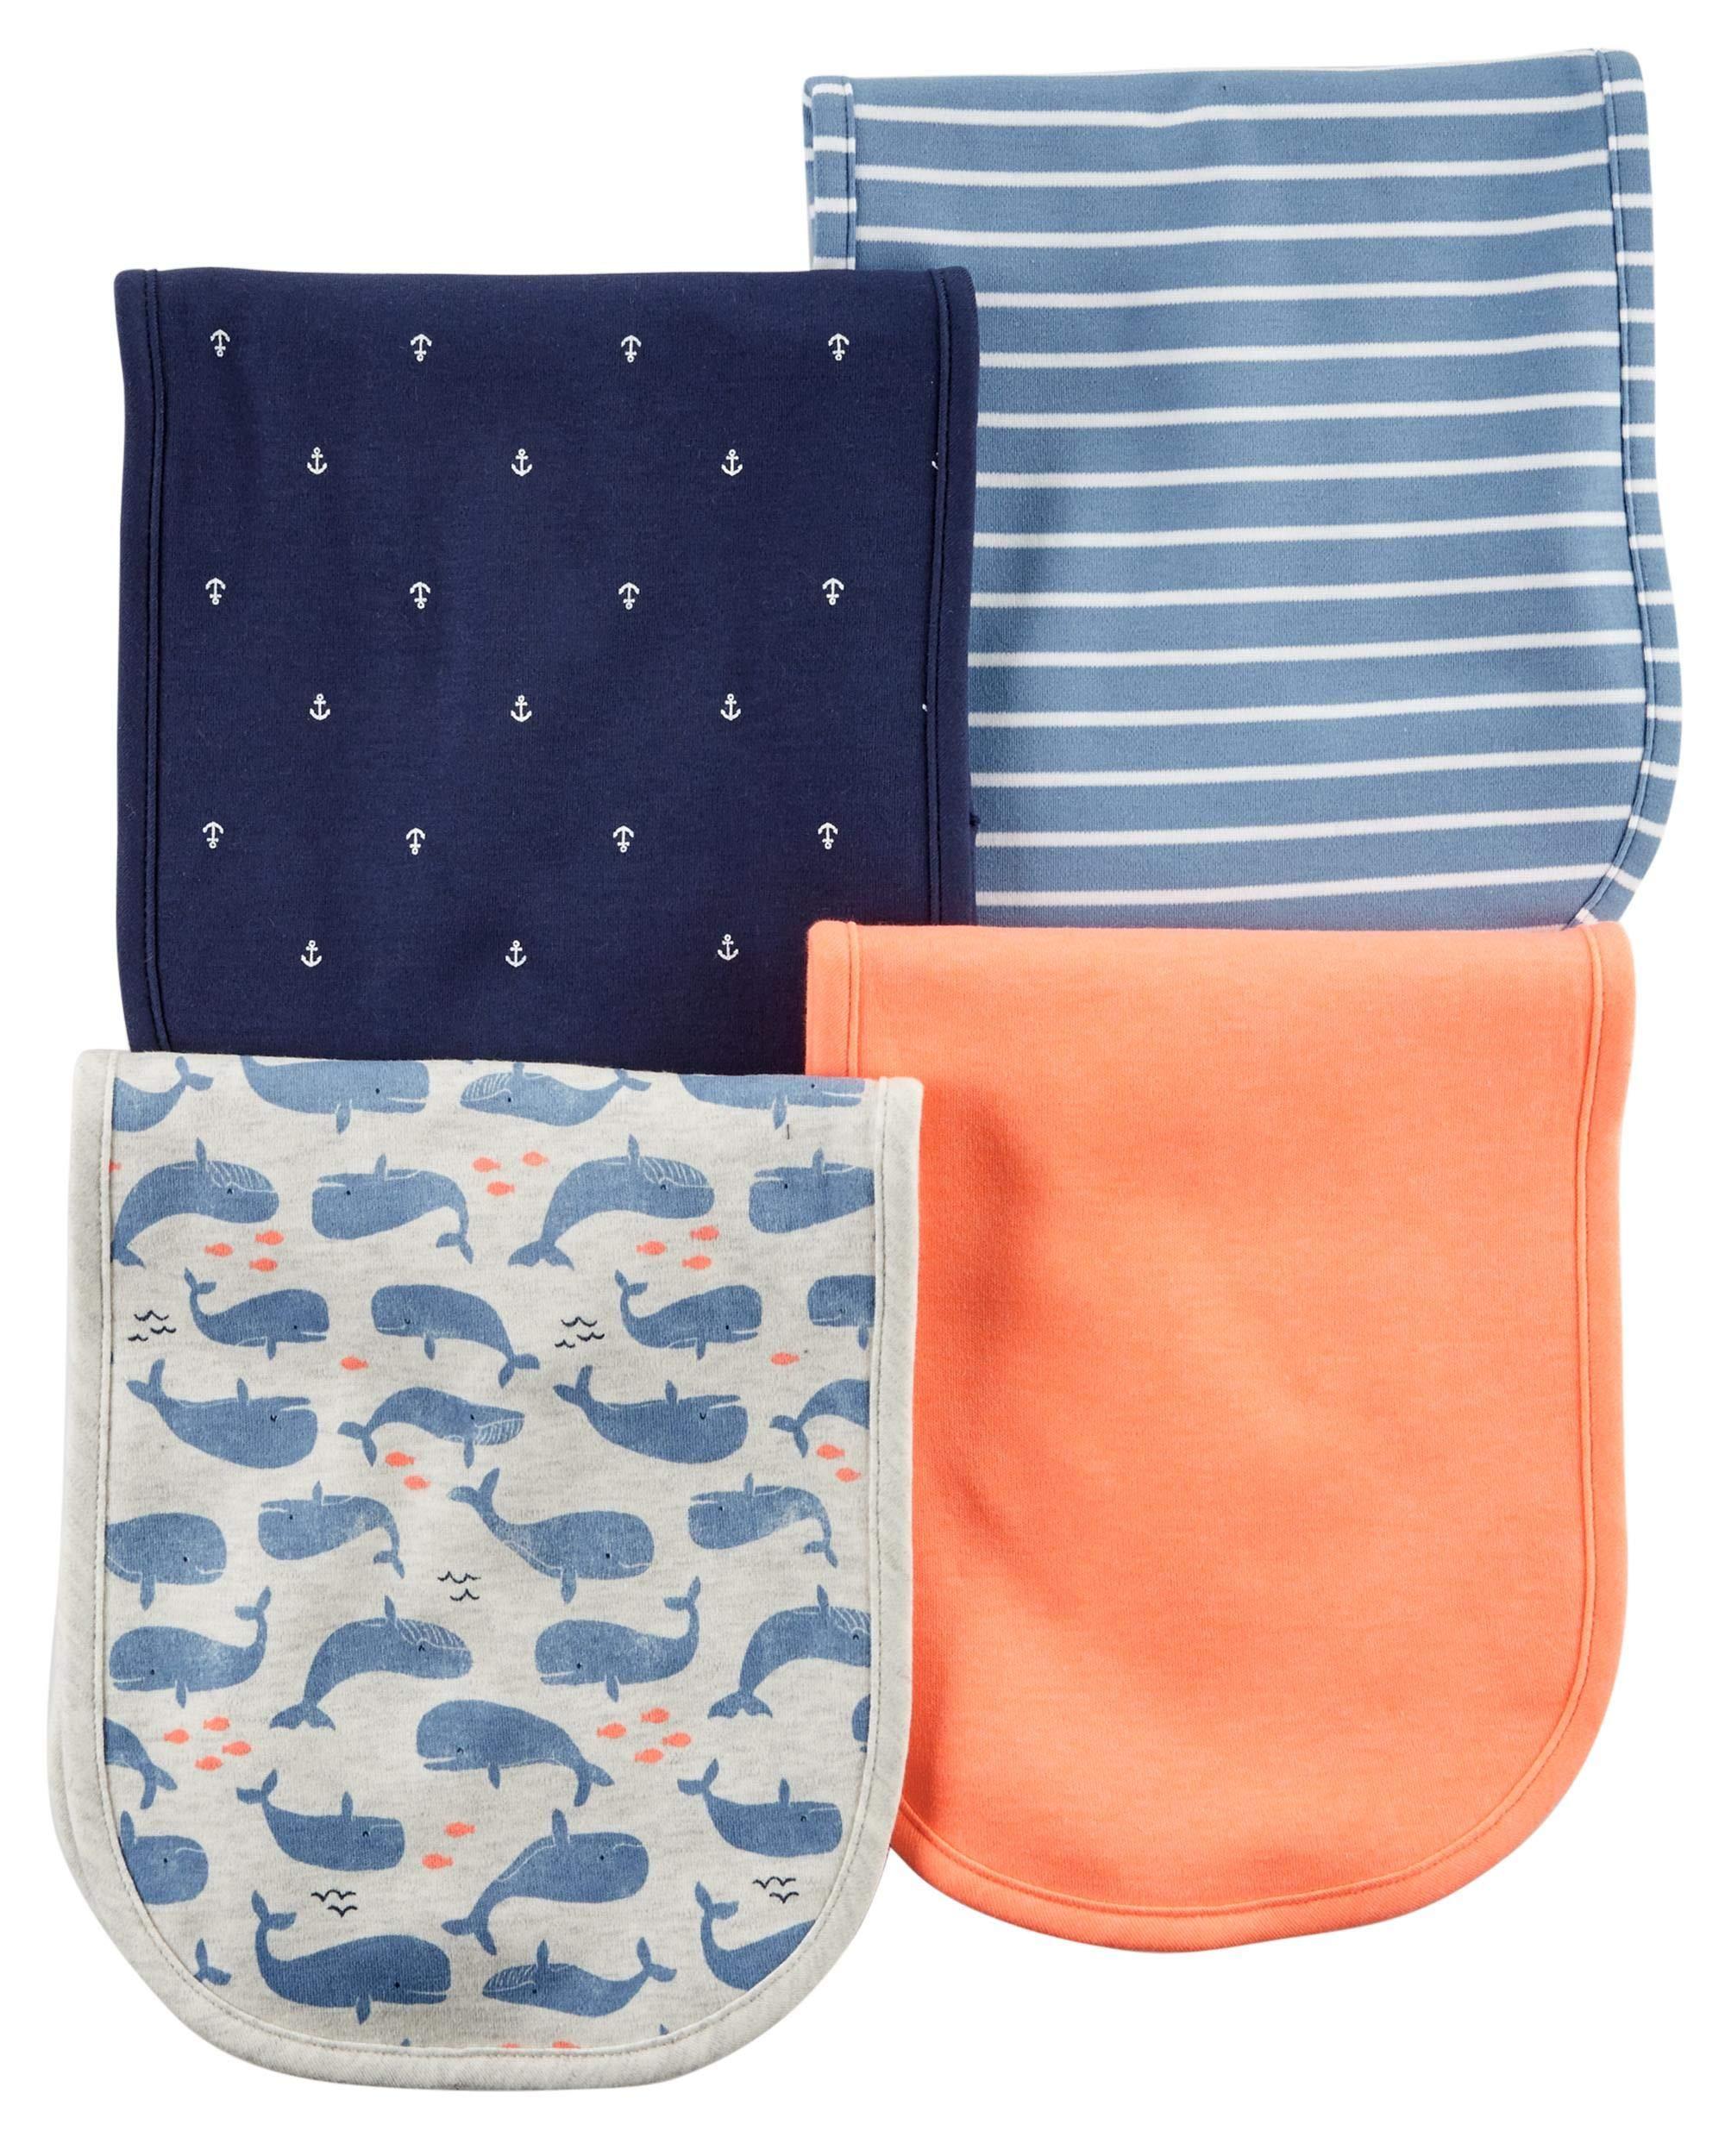 Carter's Baby Boy Ocean Whales Nautical 4-Pack Burp Cloths